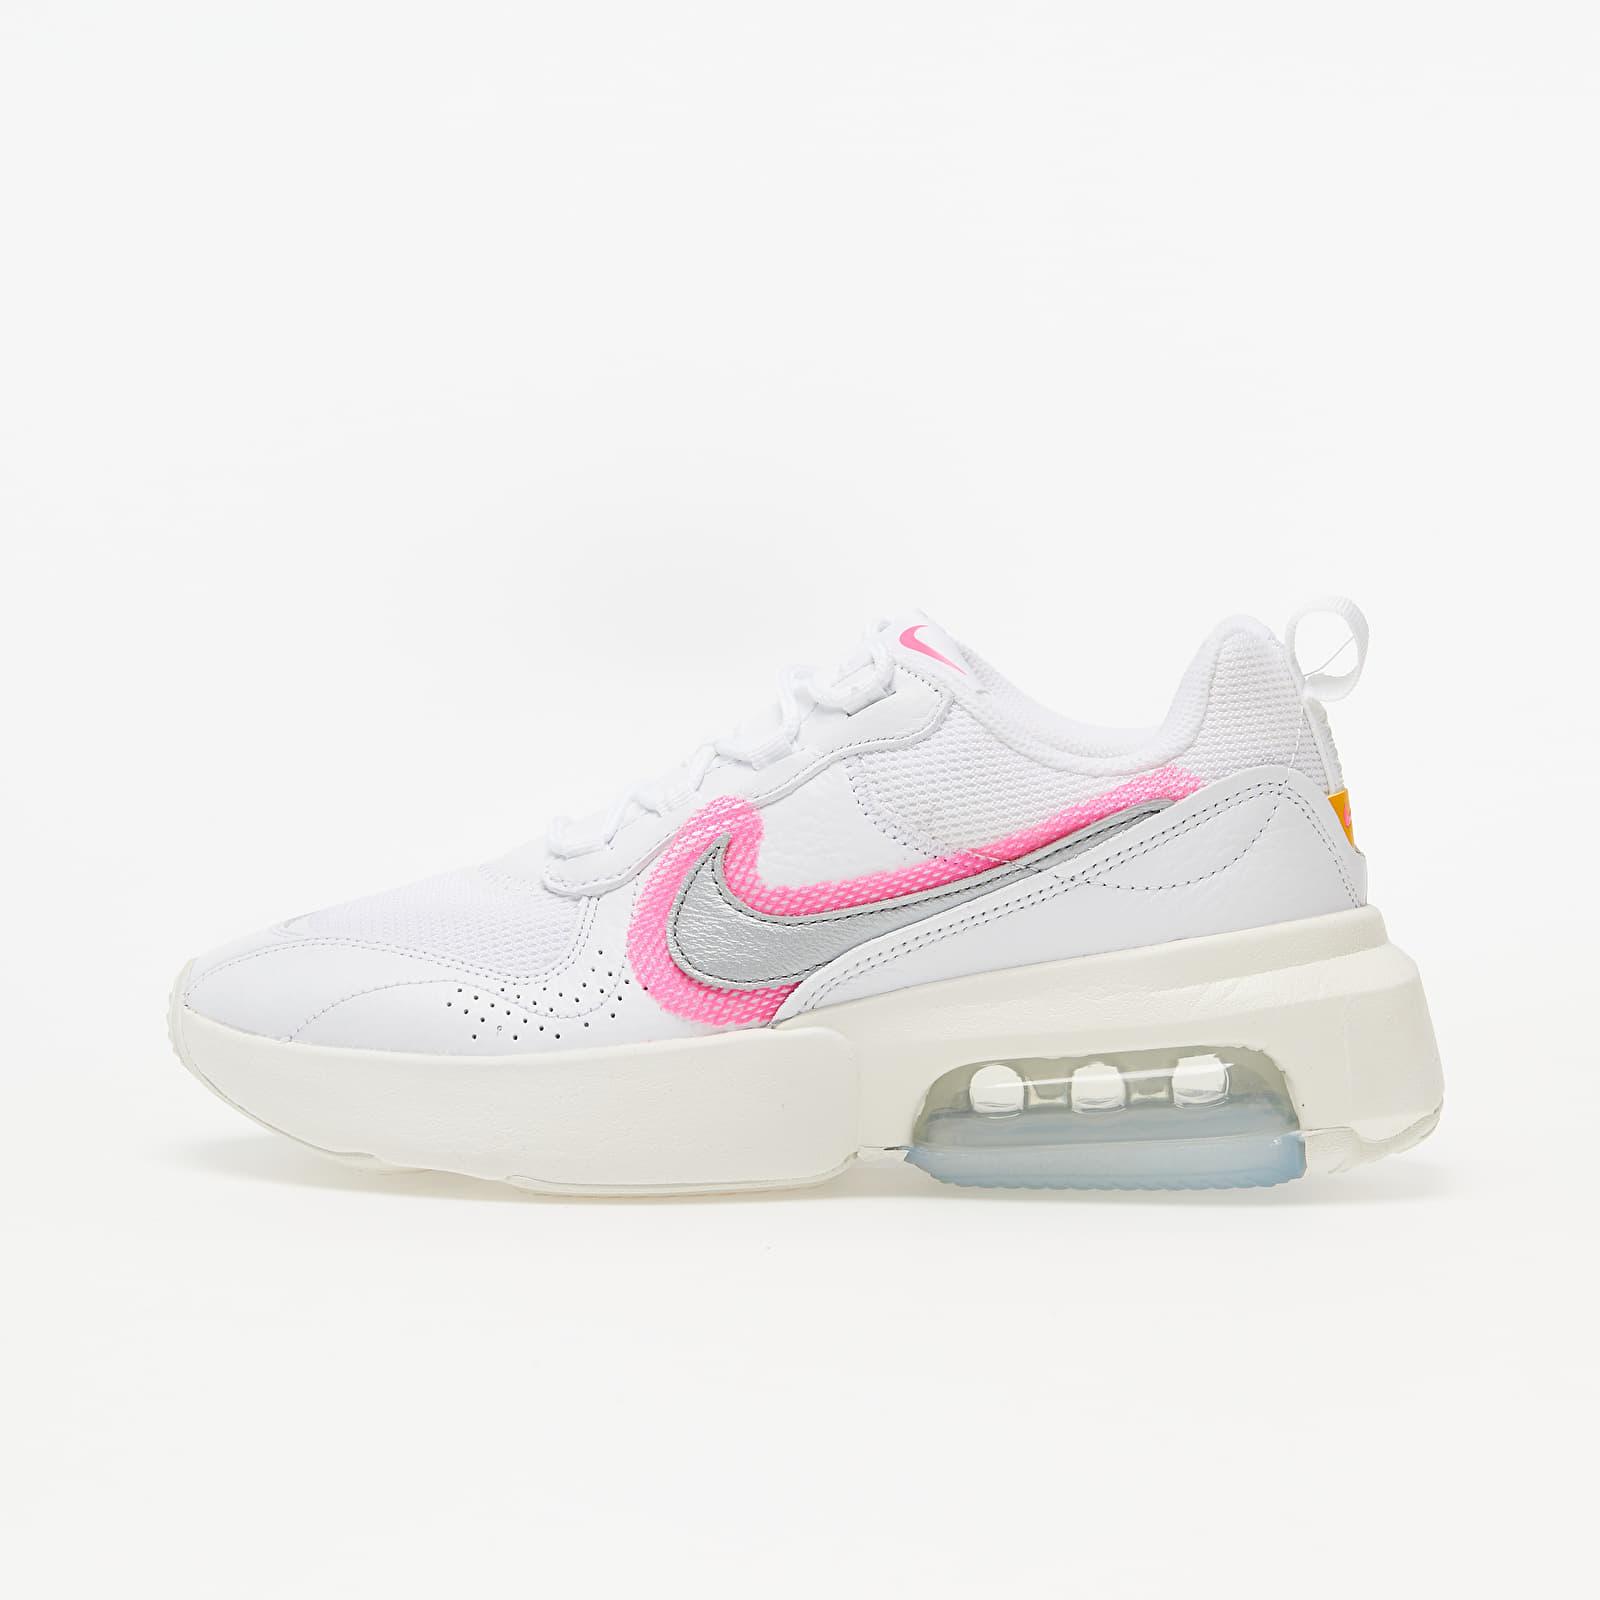 Nike W Air Max Verona White/ Metallic Silver-Hyper Pink EUR 40.5